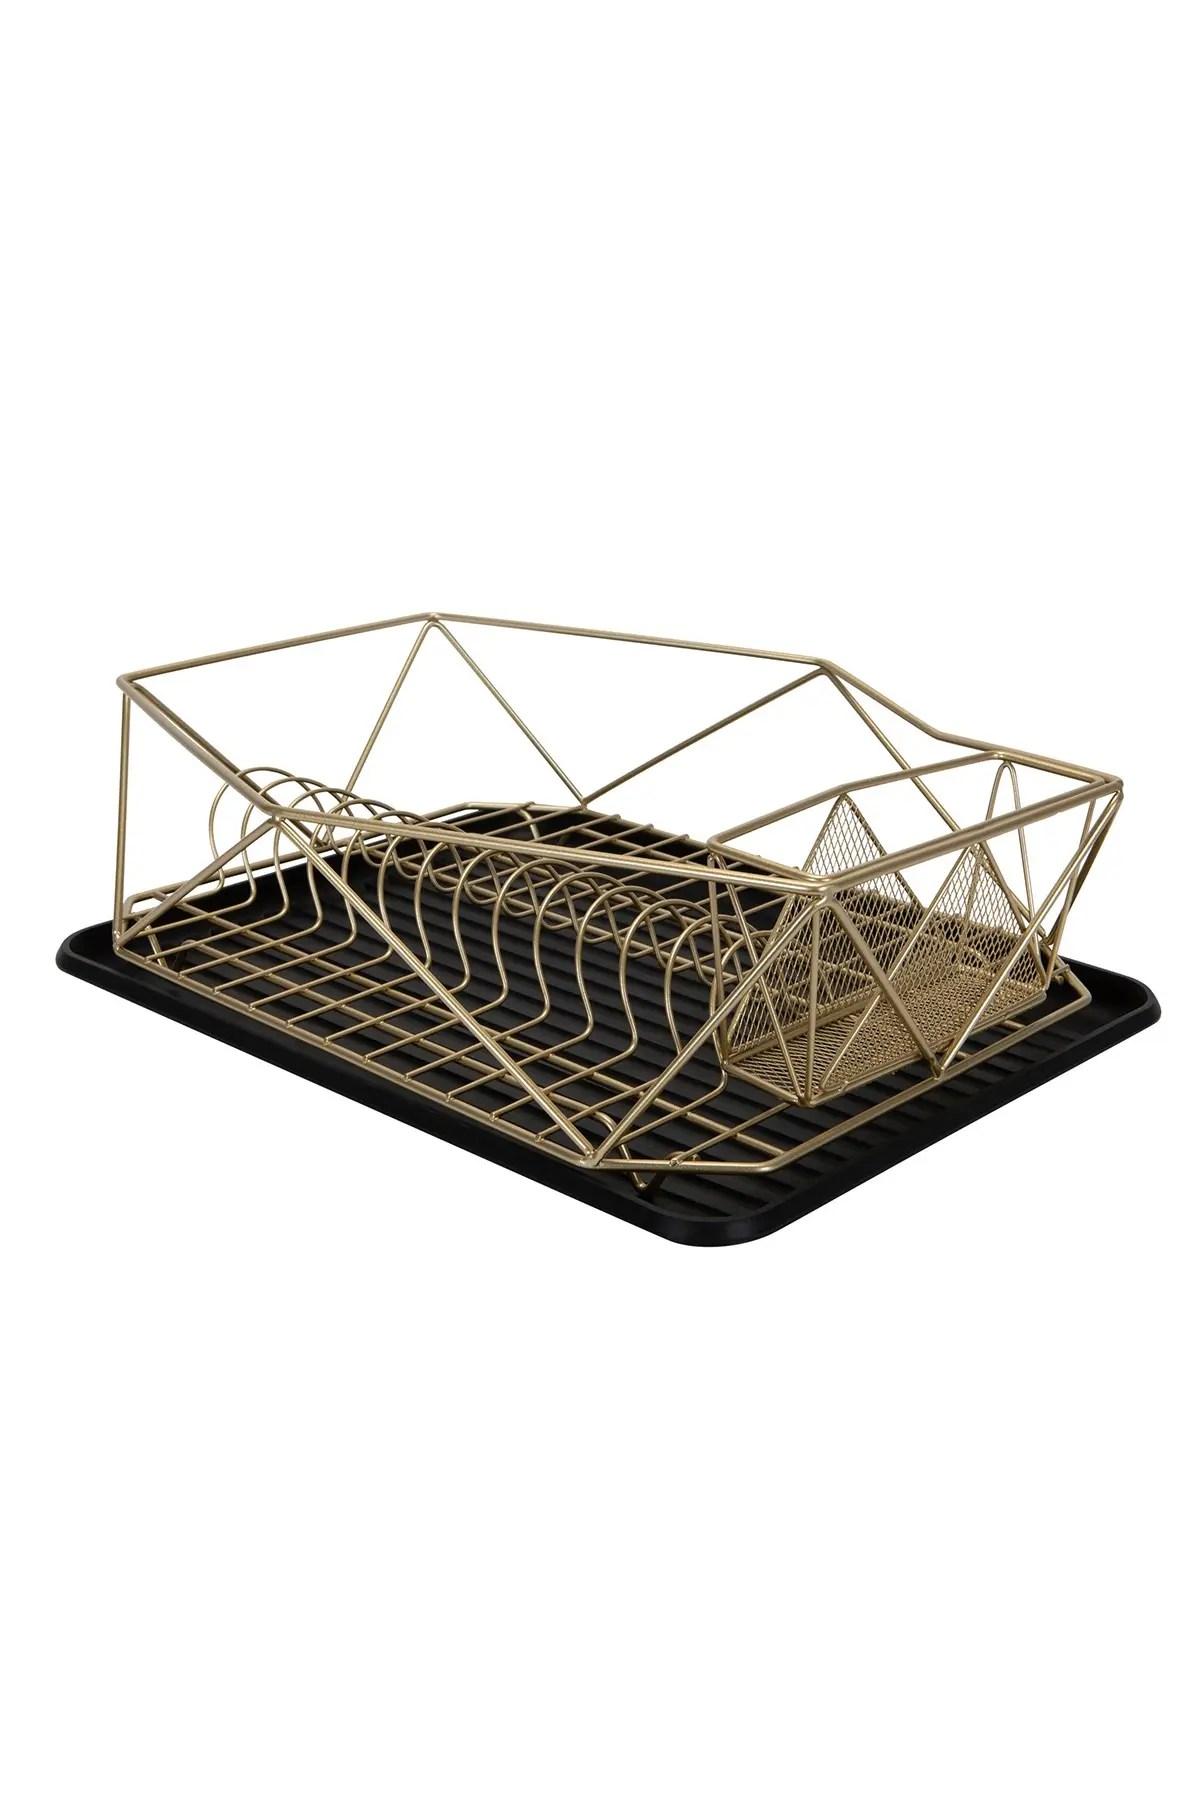 satin gold geode dish rack